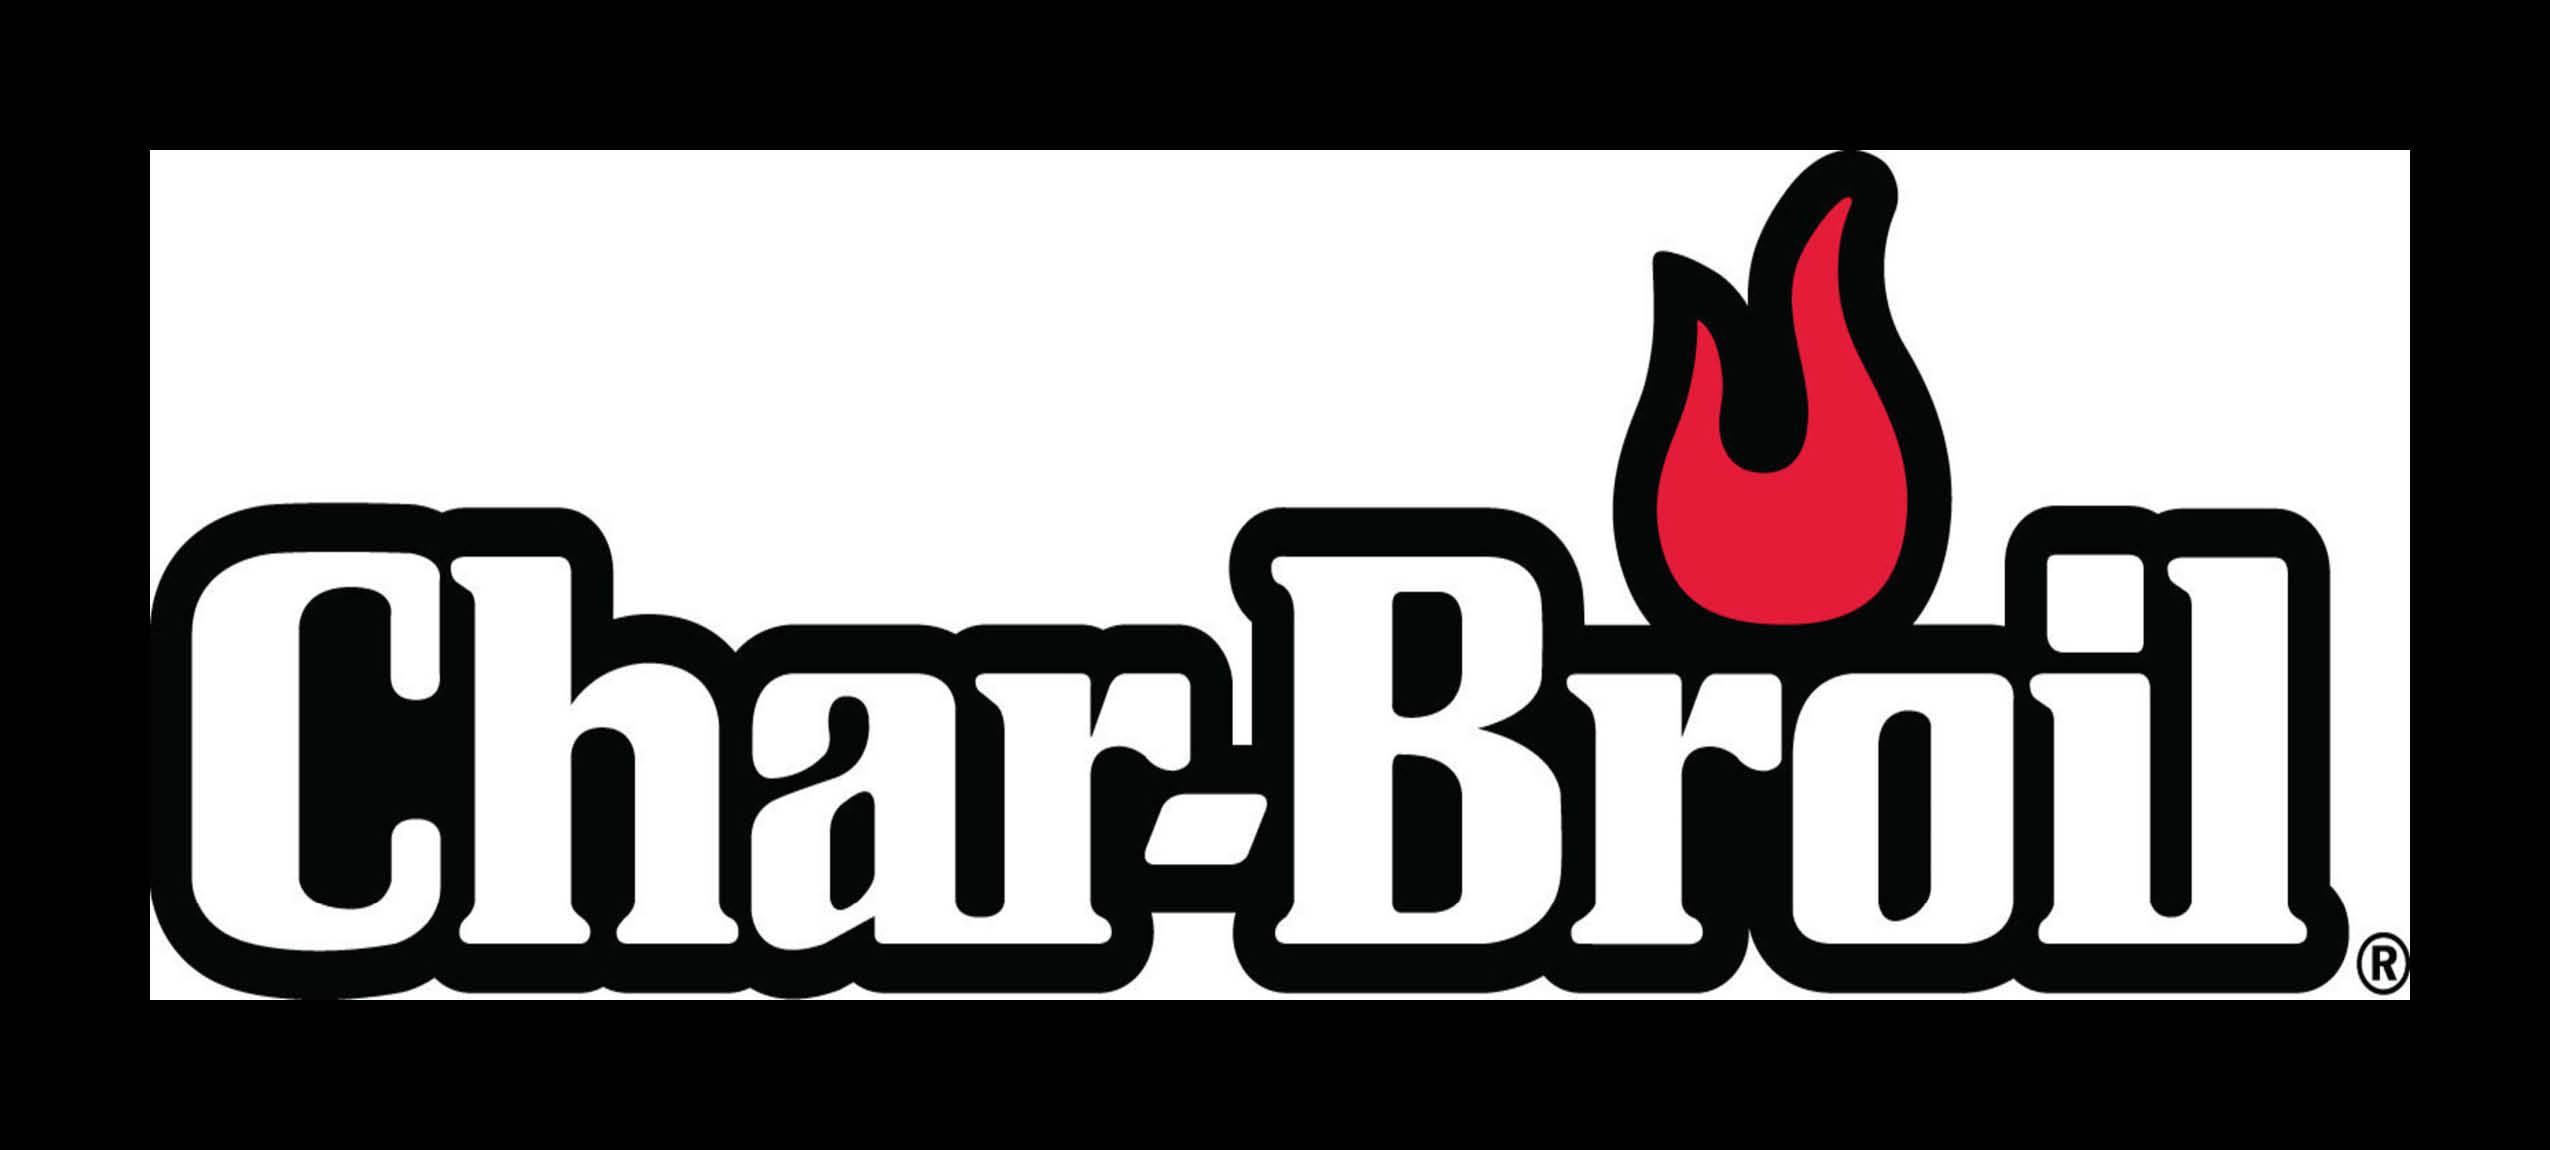 CharbroilBrand2